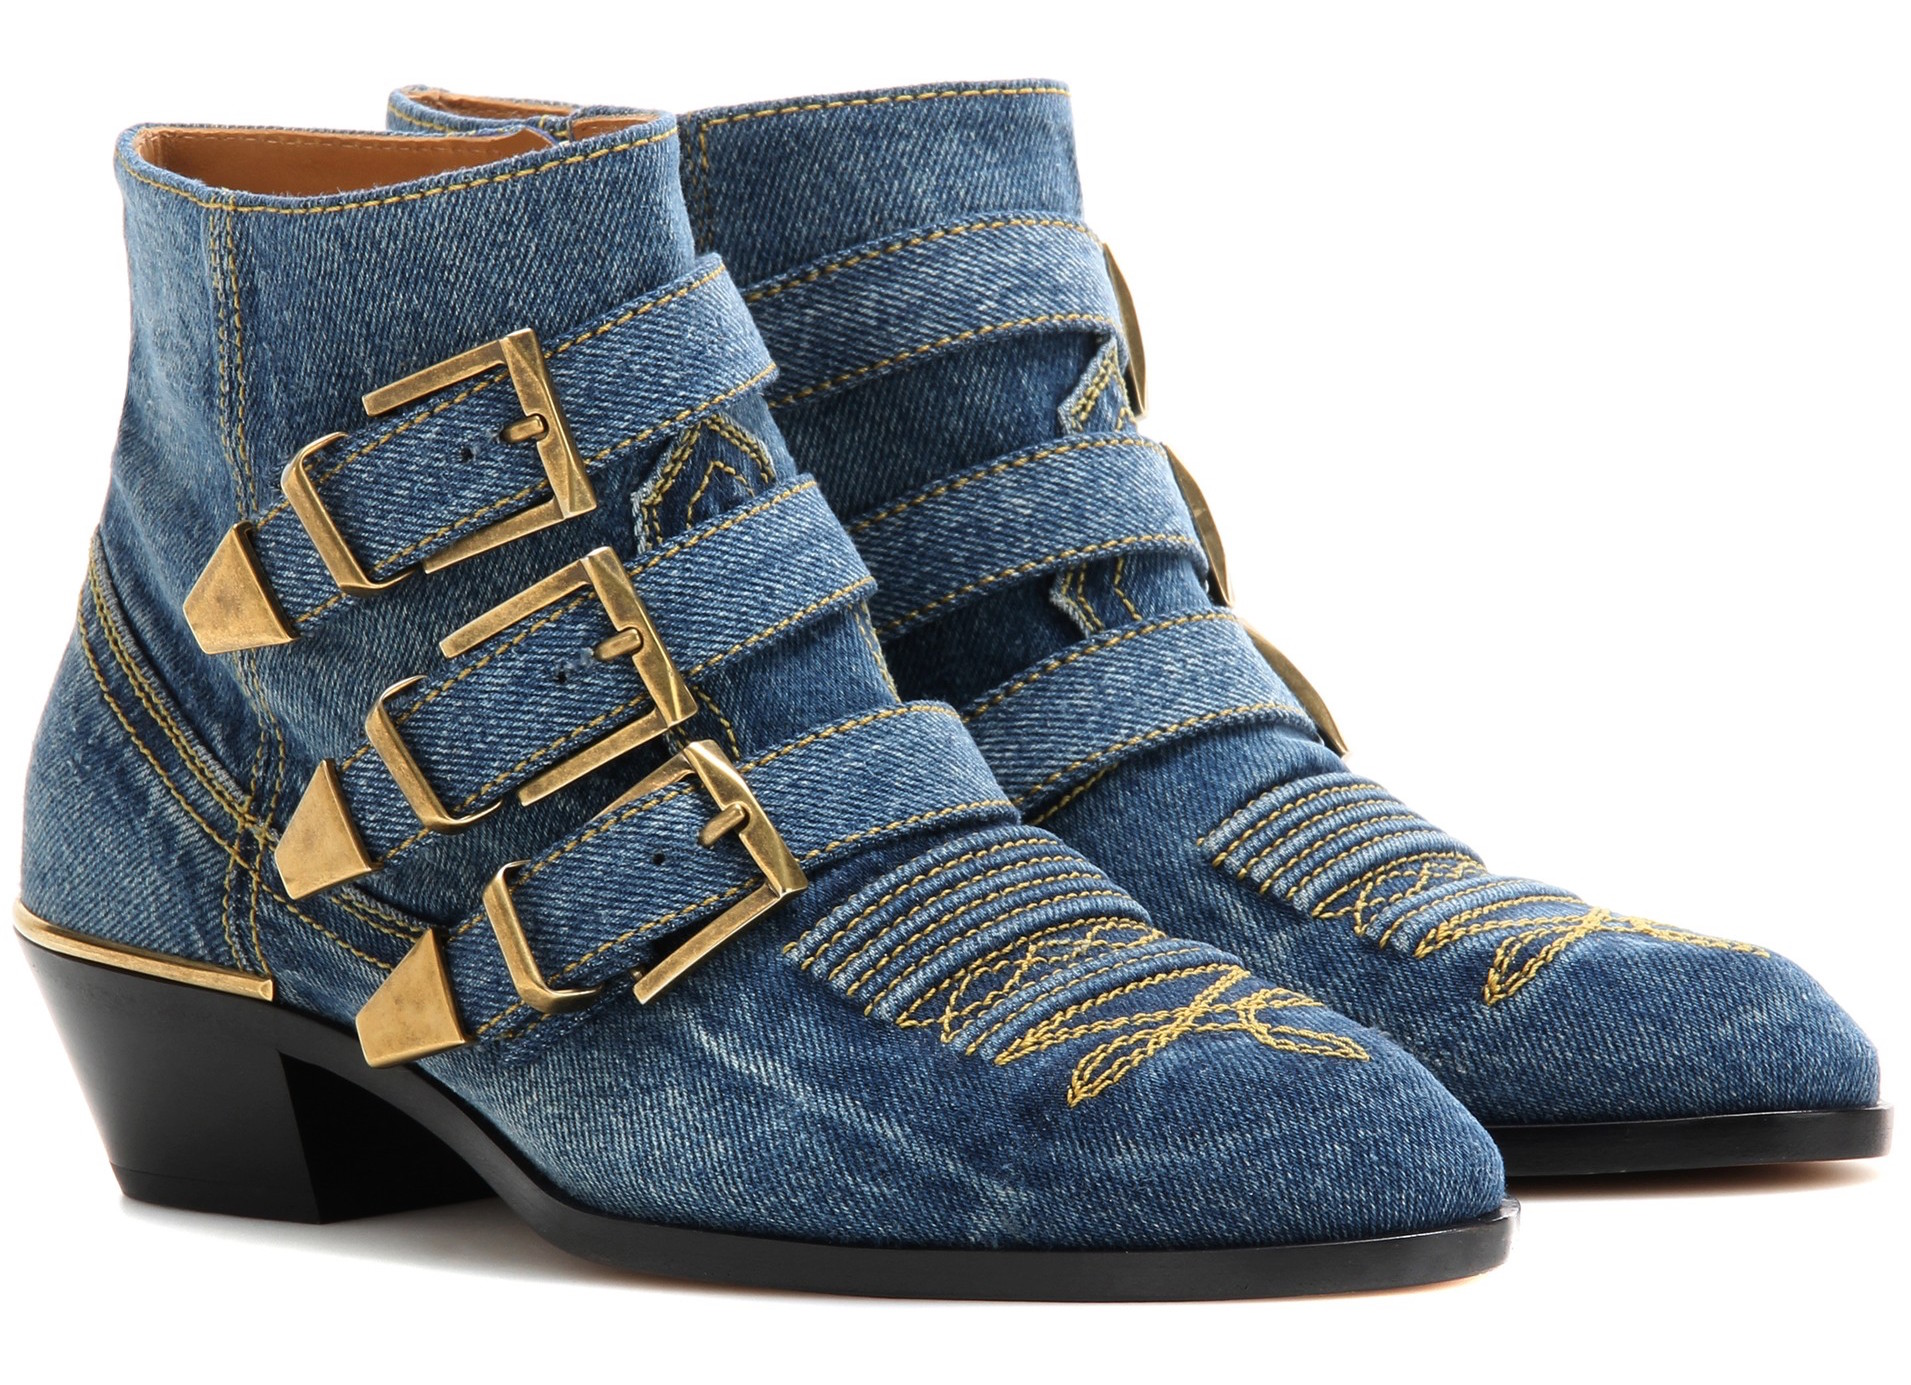 chloe-kris-denim-ankle-boots-3